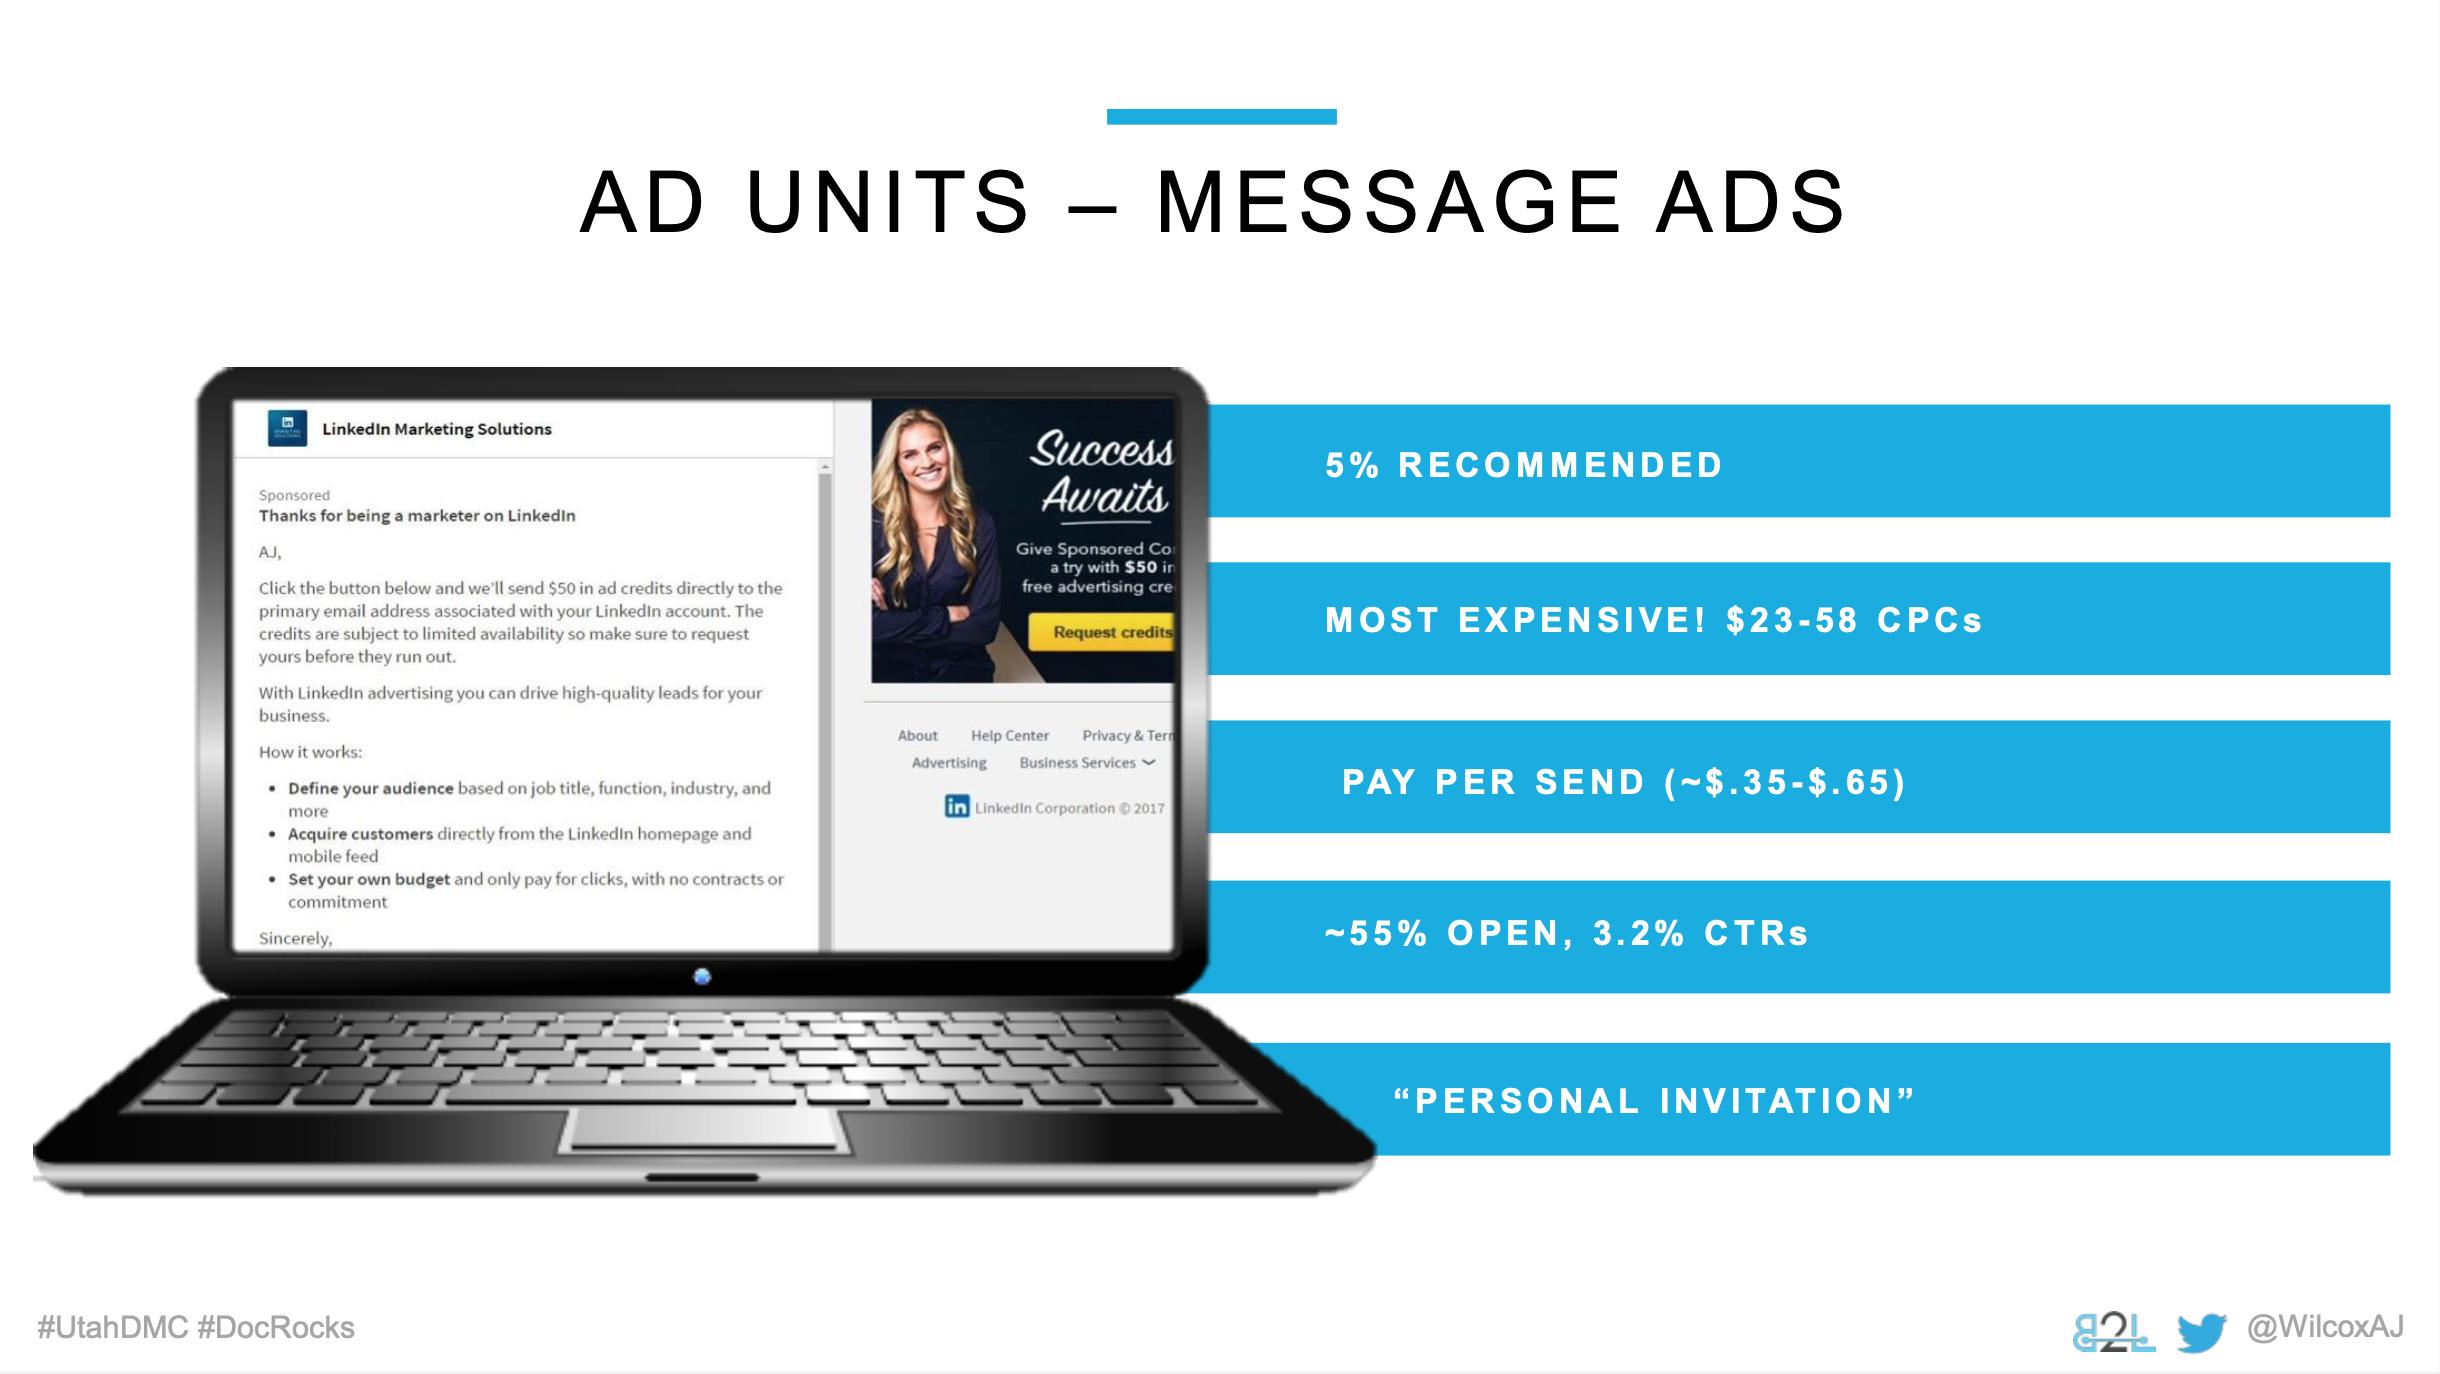 Utah DMC LinkedIn Ads - Aj Wilcox - Ad Units - Message Ads